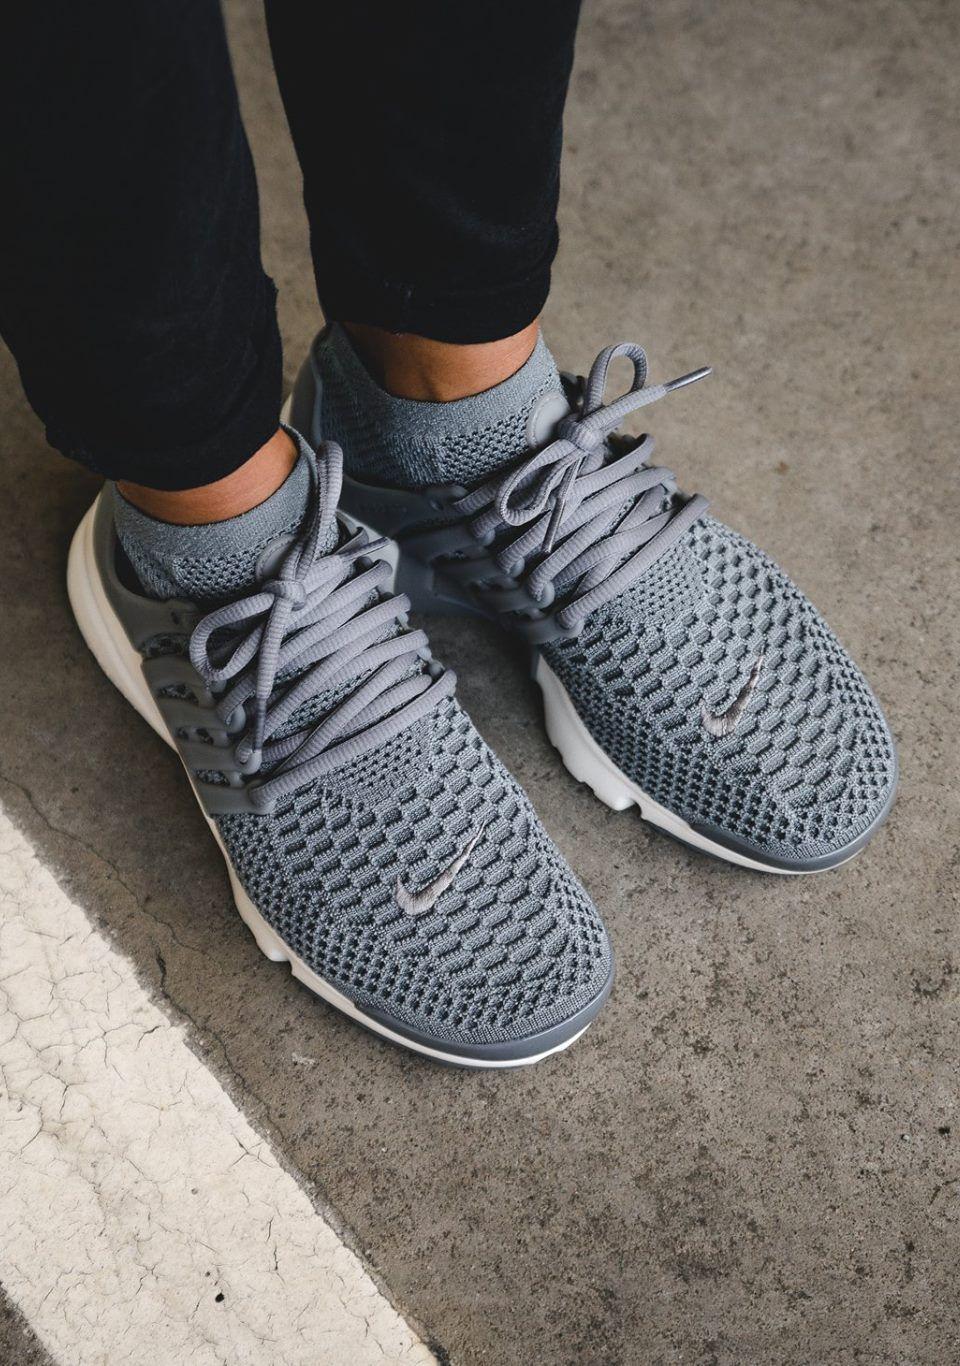 Unstablefragments2 Nike Wmns Air Presto Flyknit Cool Grey Via Kicks Daily Com Womens Running Shoes Nike Shoes Women Running Shoes Nike